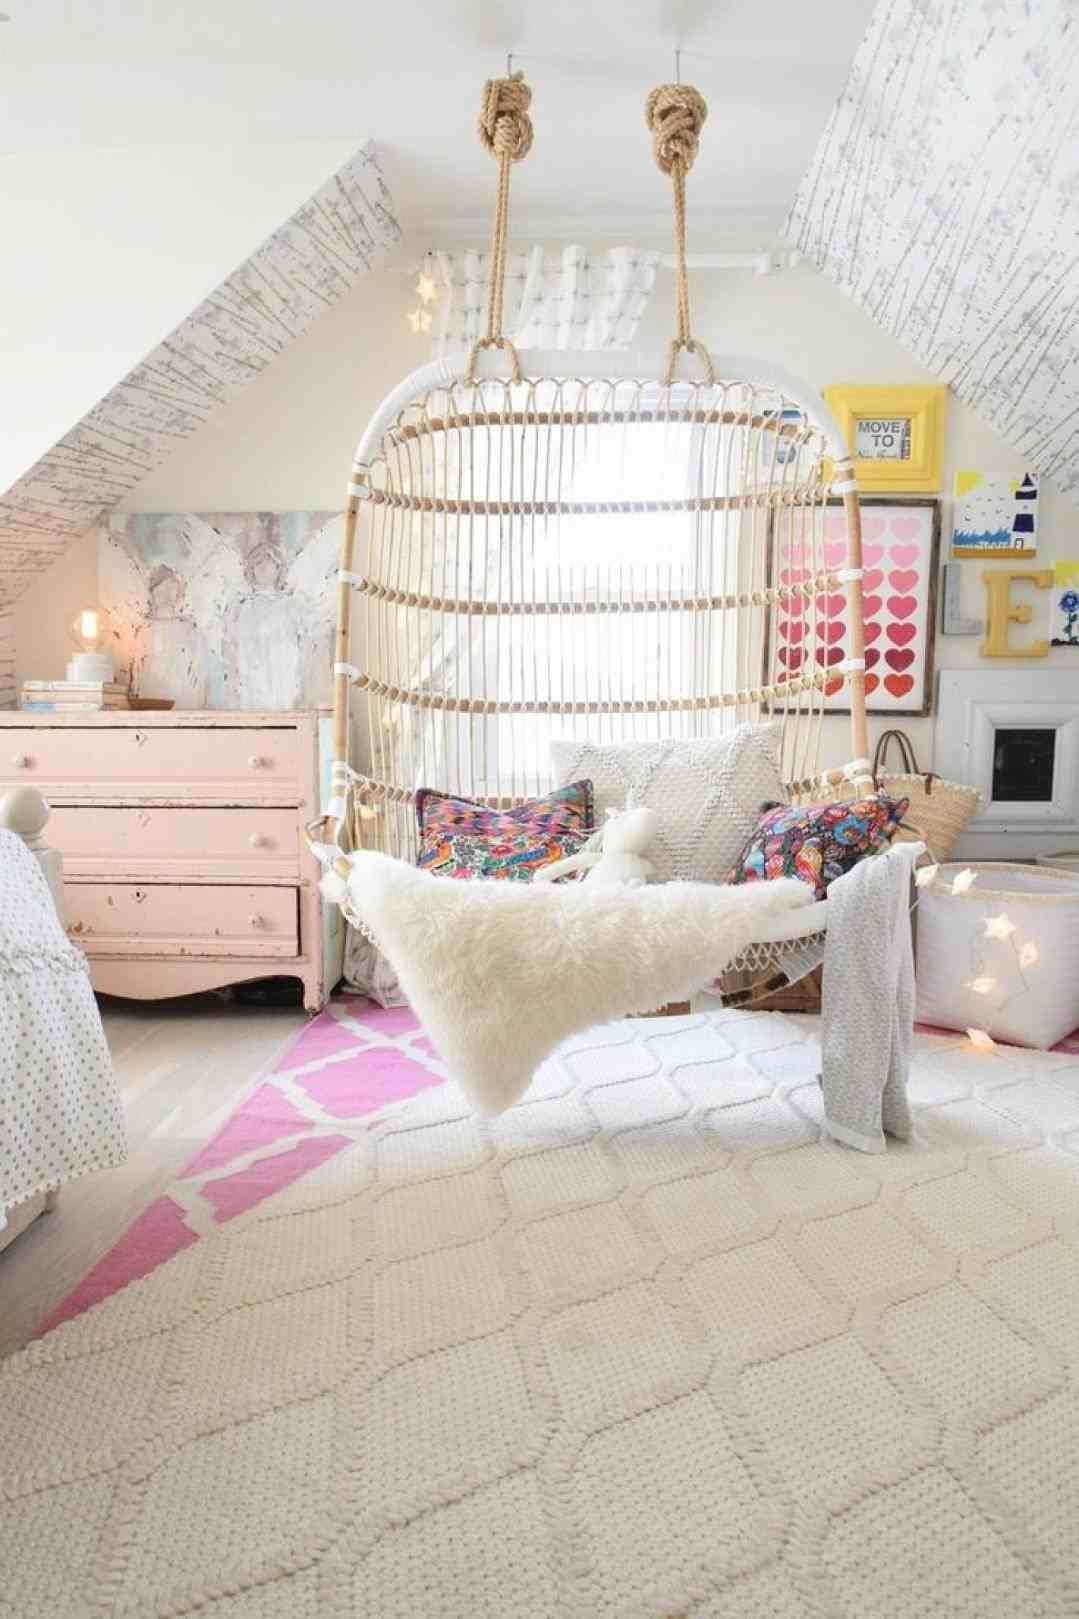 Hammock Bed for Bedroom Inspirational Pin On Bedroom Ideas